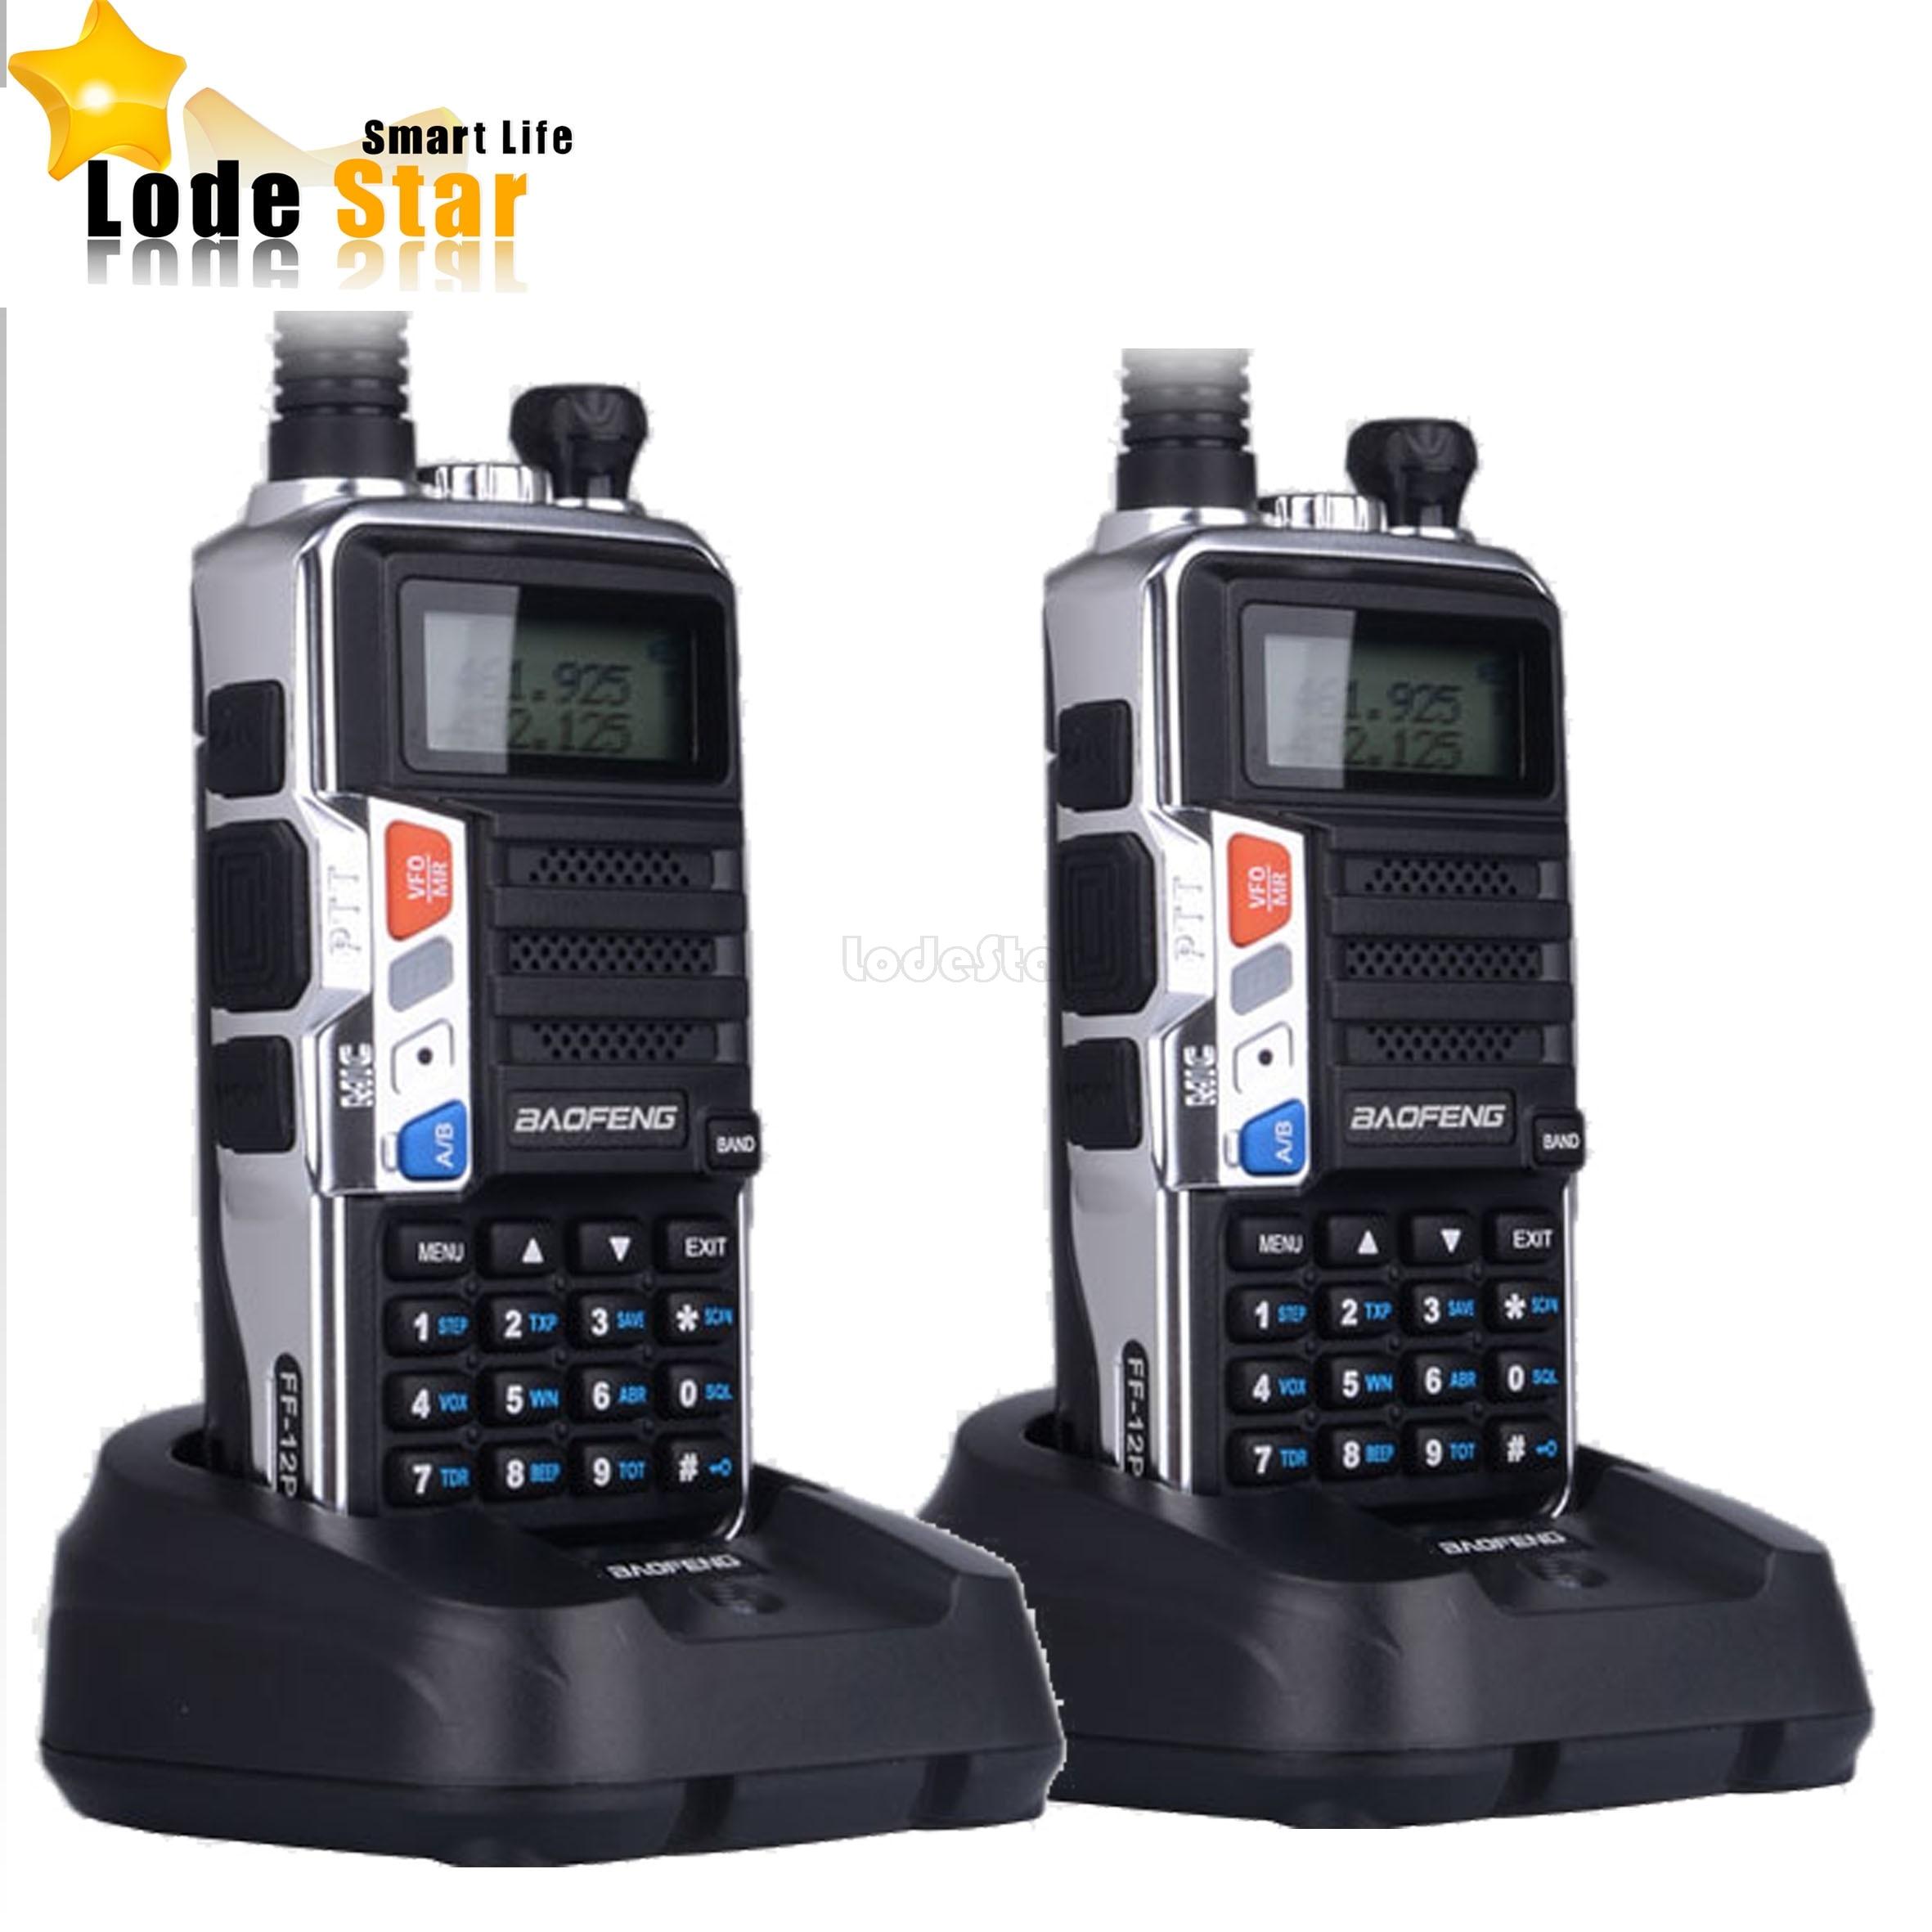 imágenes para 2 UNIDS FF-12P BaoFeng UV5R Actualizado 5 W de largo alcance Walkie Talkie Portátil Receptor de FM Profesional Dual Band VHF/UHF CB radio